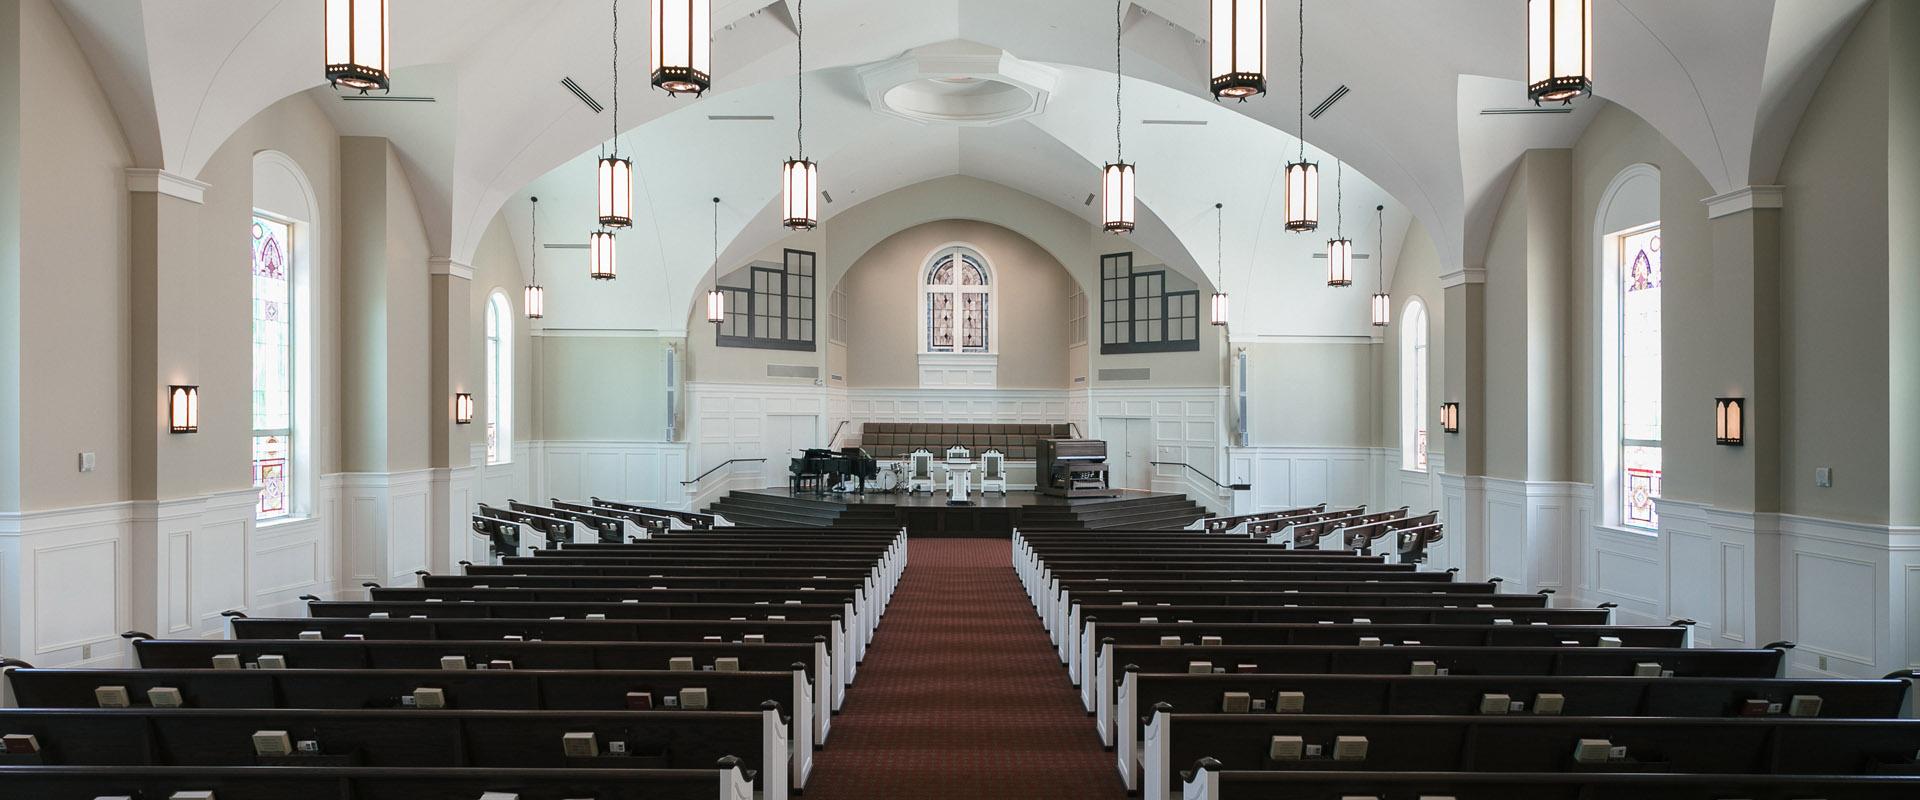 Friendship Baptist Church - Sanctuary